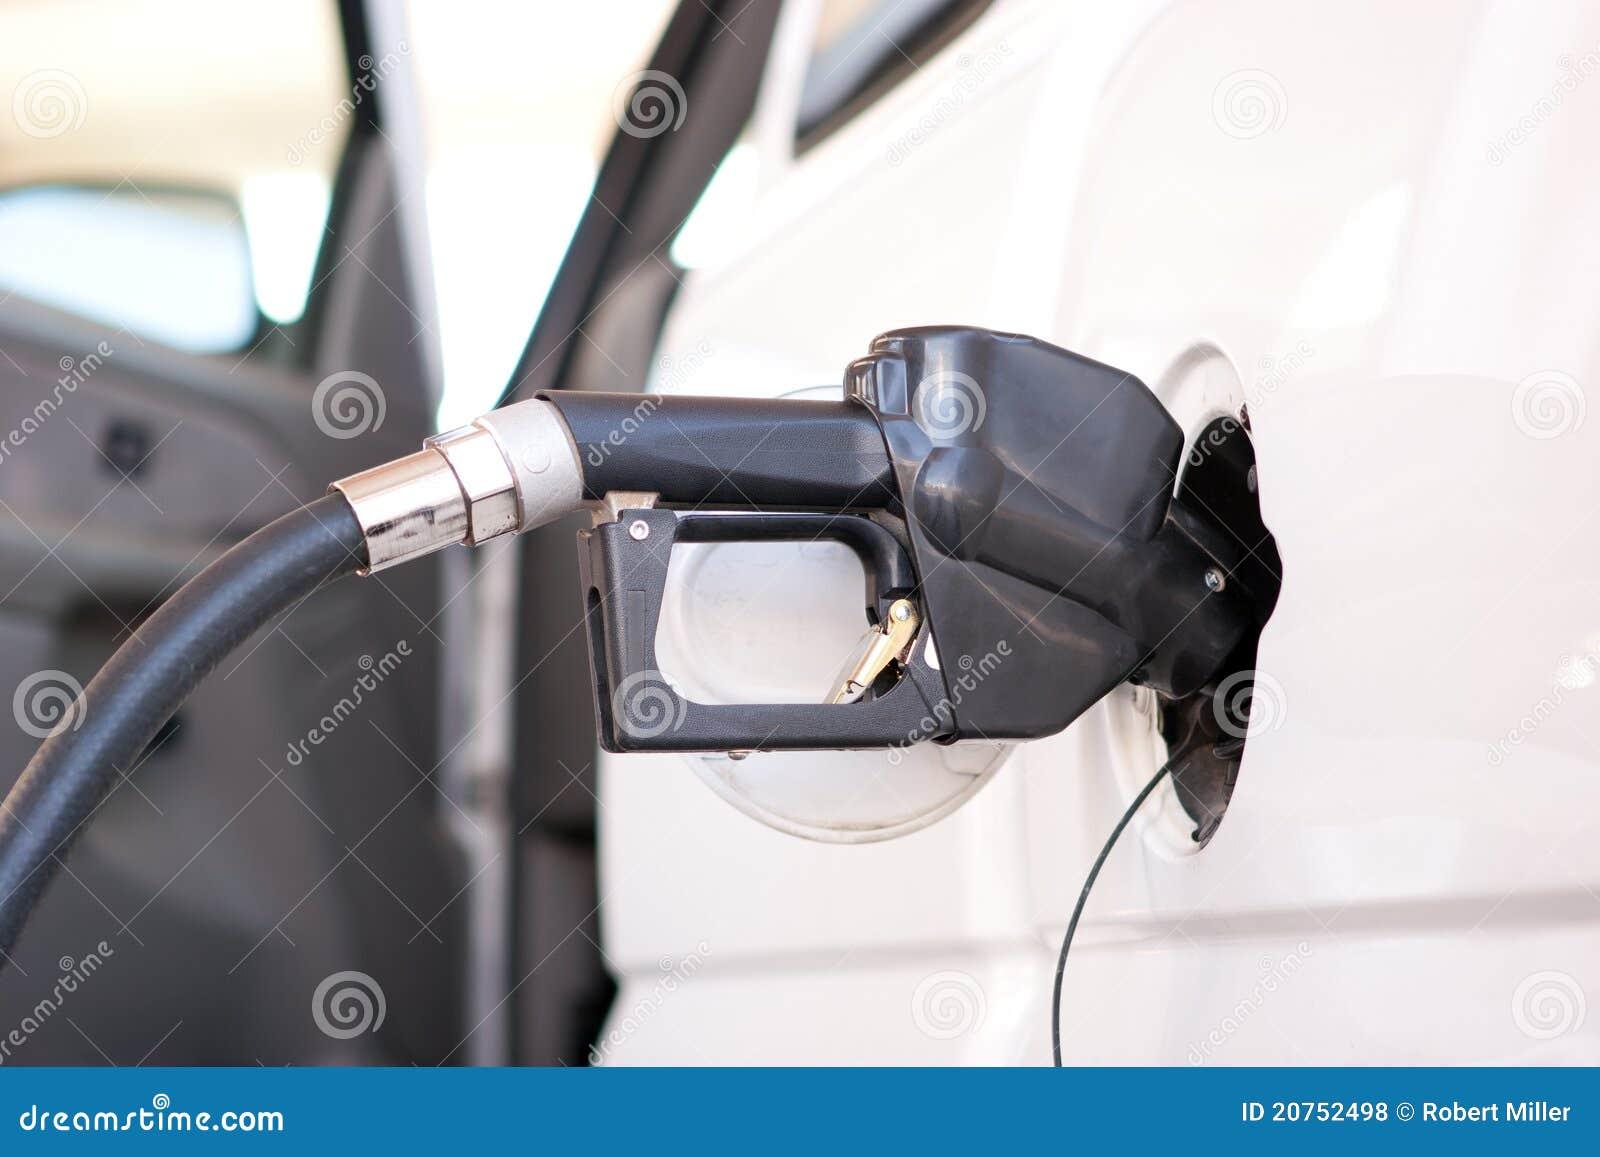 Boquilla del surtidor de gasolina